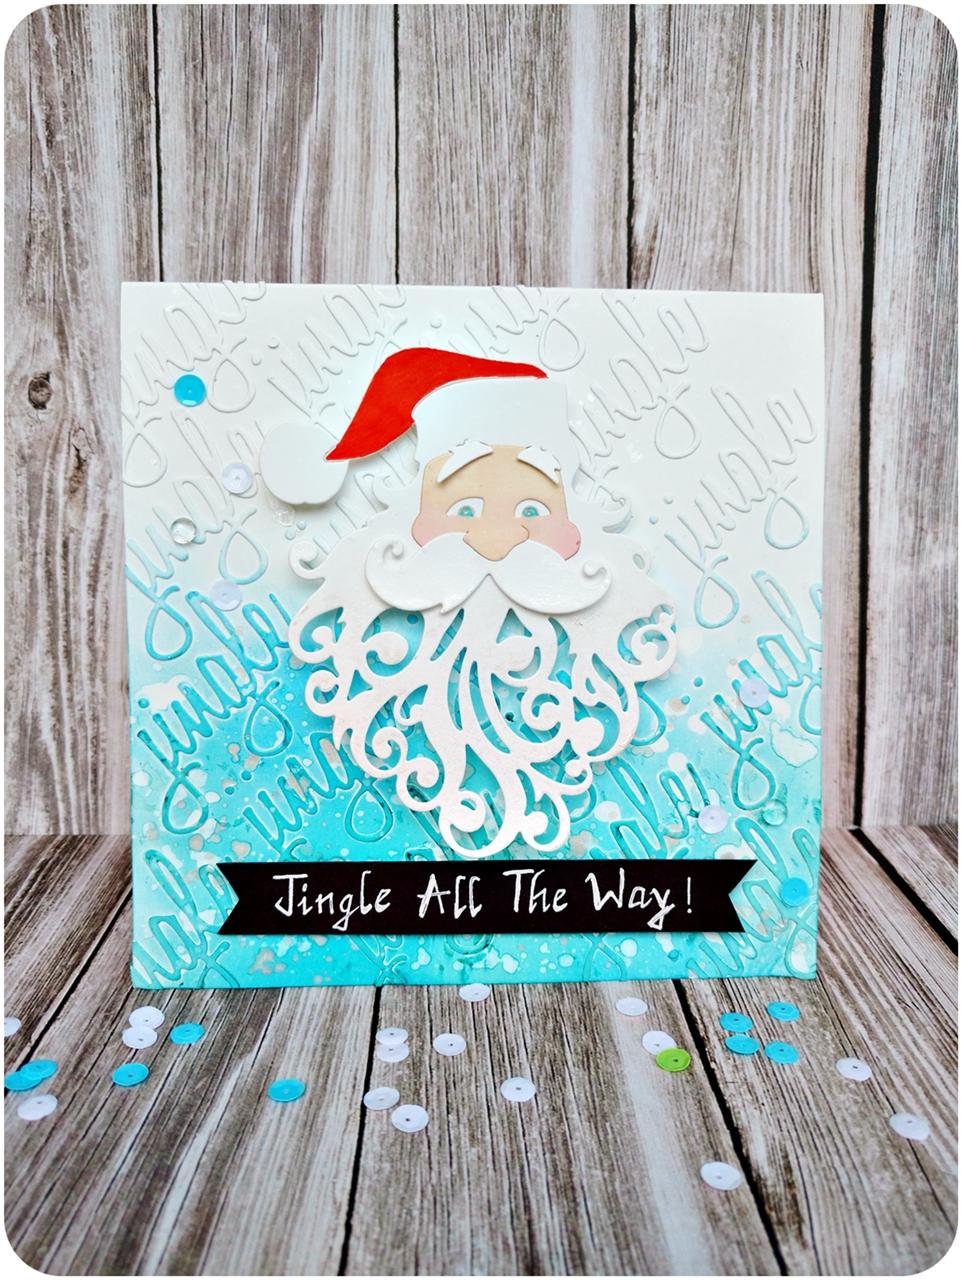 Jingle All The Way Sizzix Blog